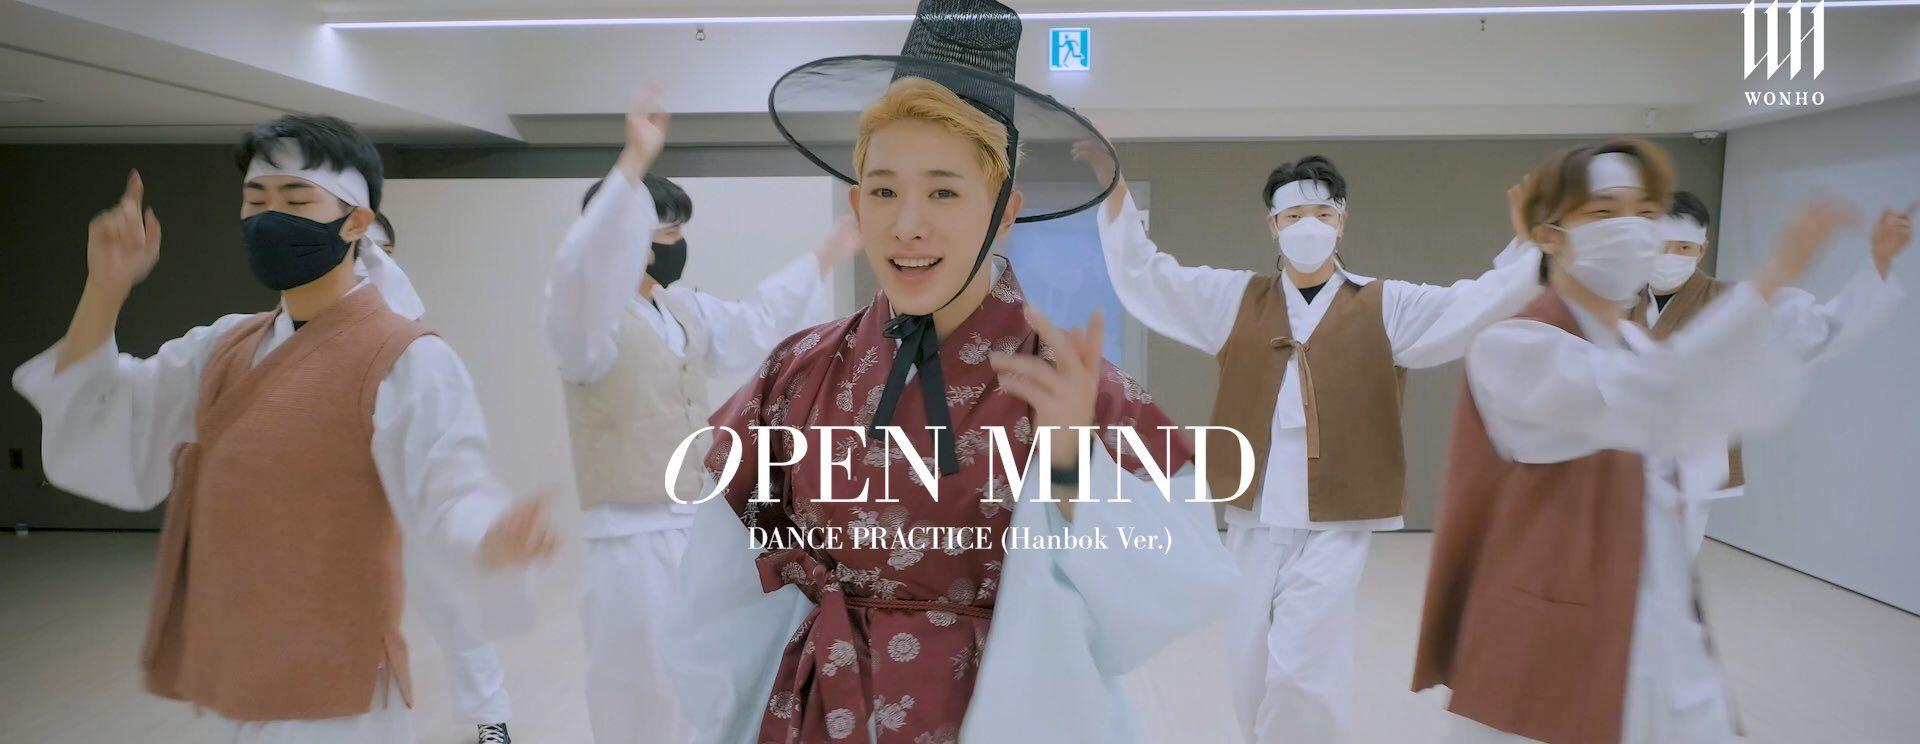 "Wonho Releases A Heartwarming Hanbok Version Dance Practice Video For ""Open Mind"""